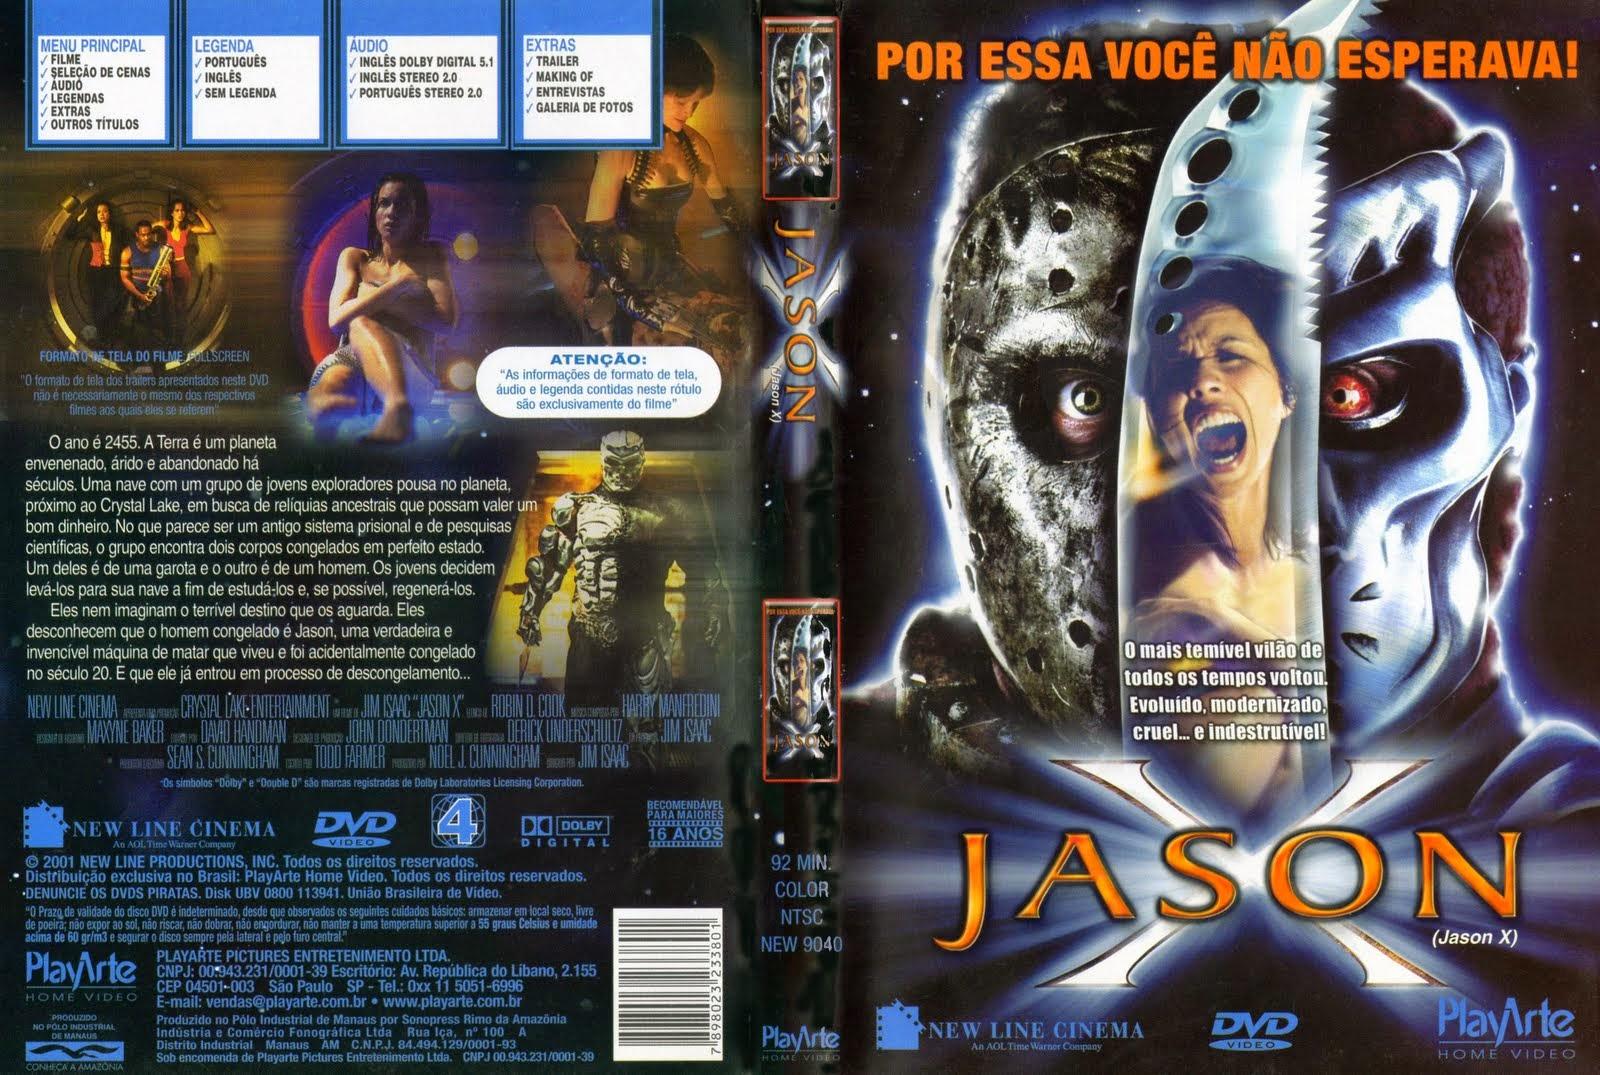 Sexta-Feira 13 Parte 10 - Jason X DVD Capa